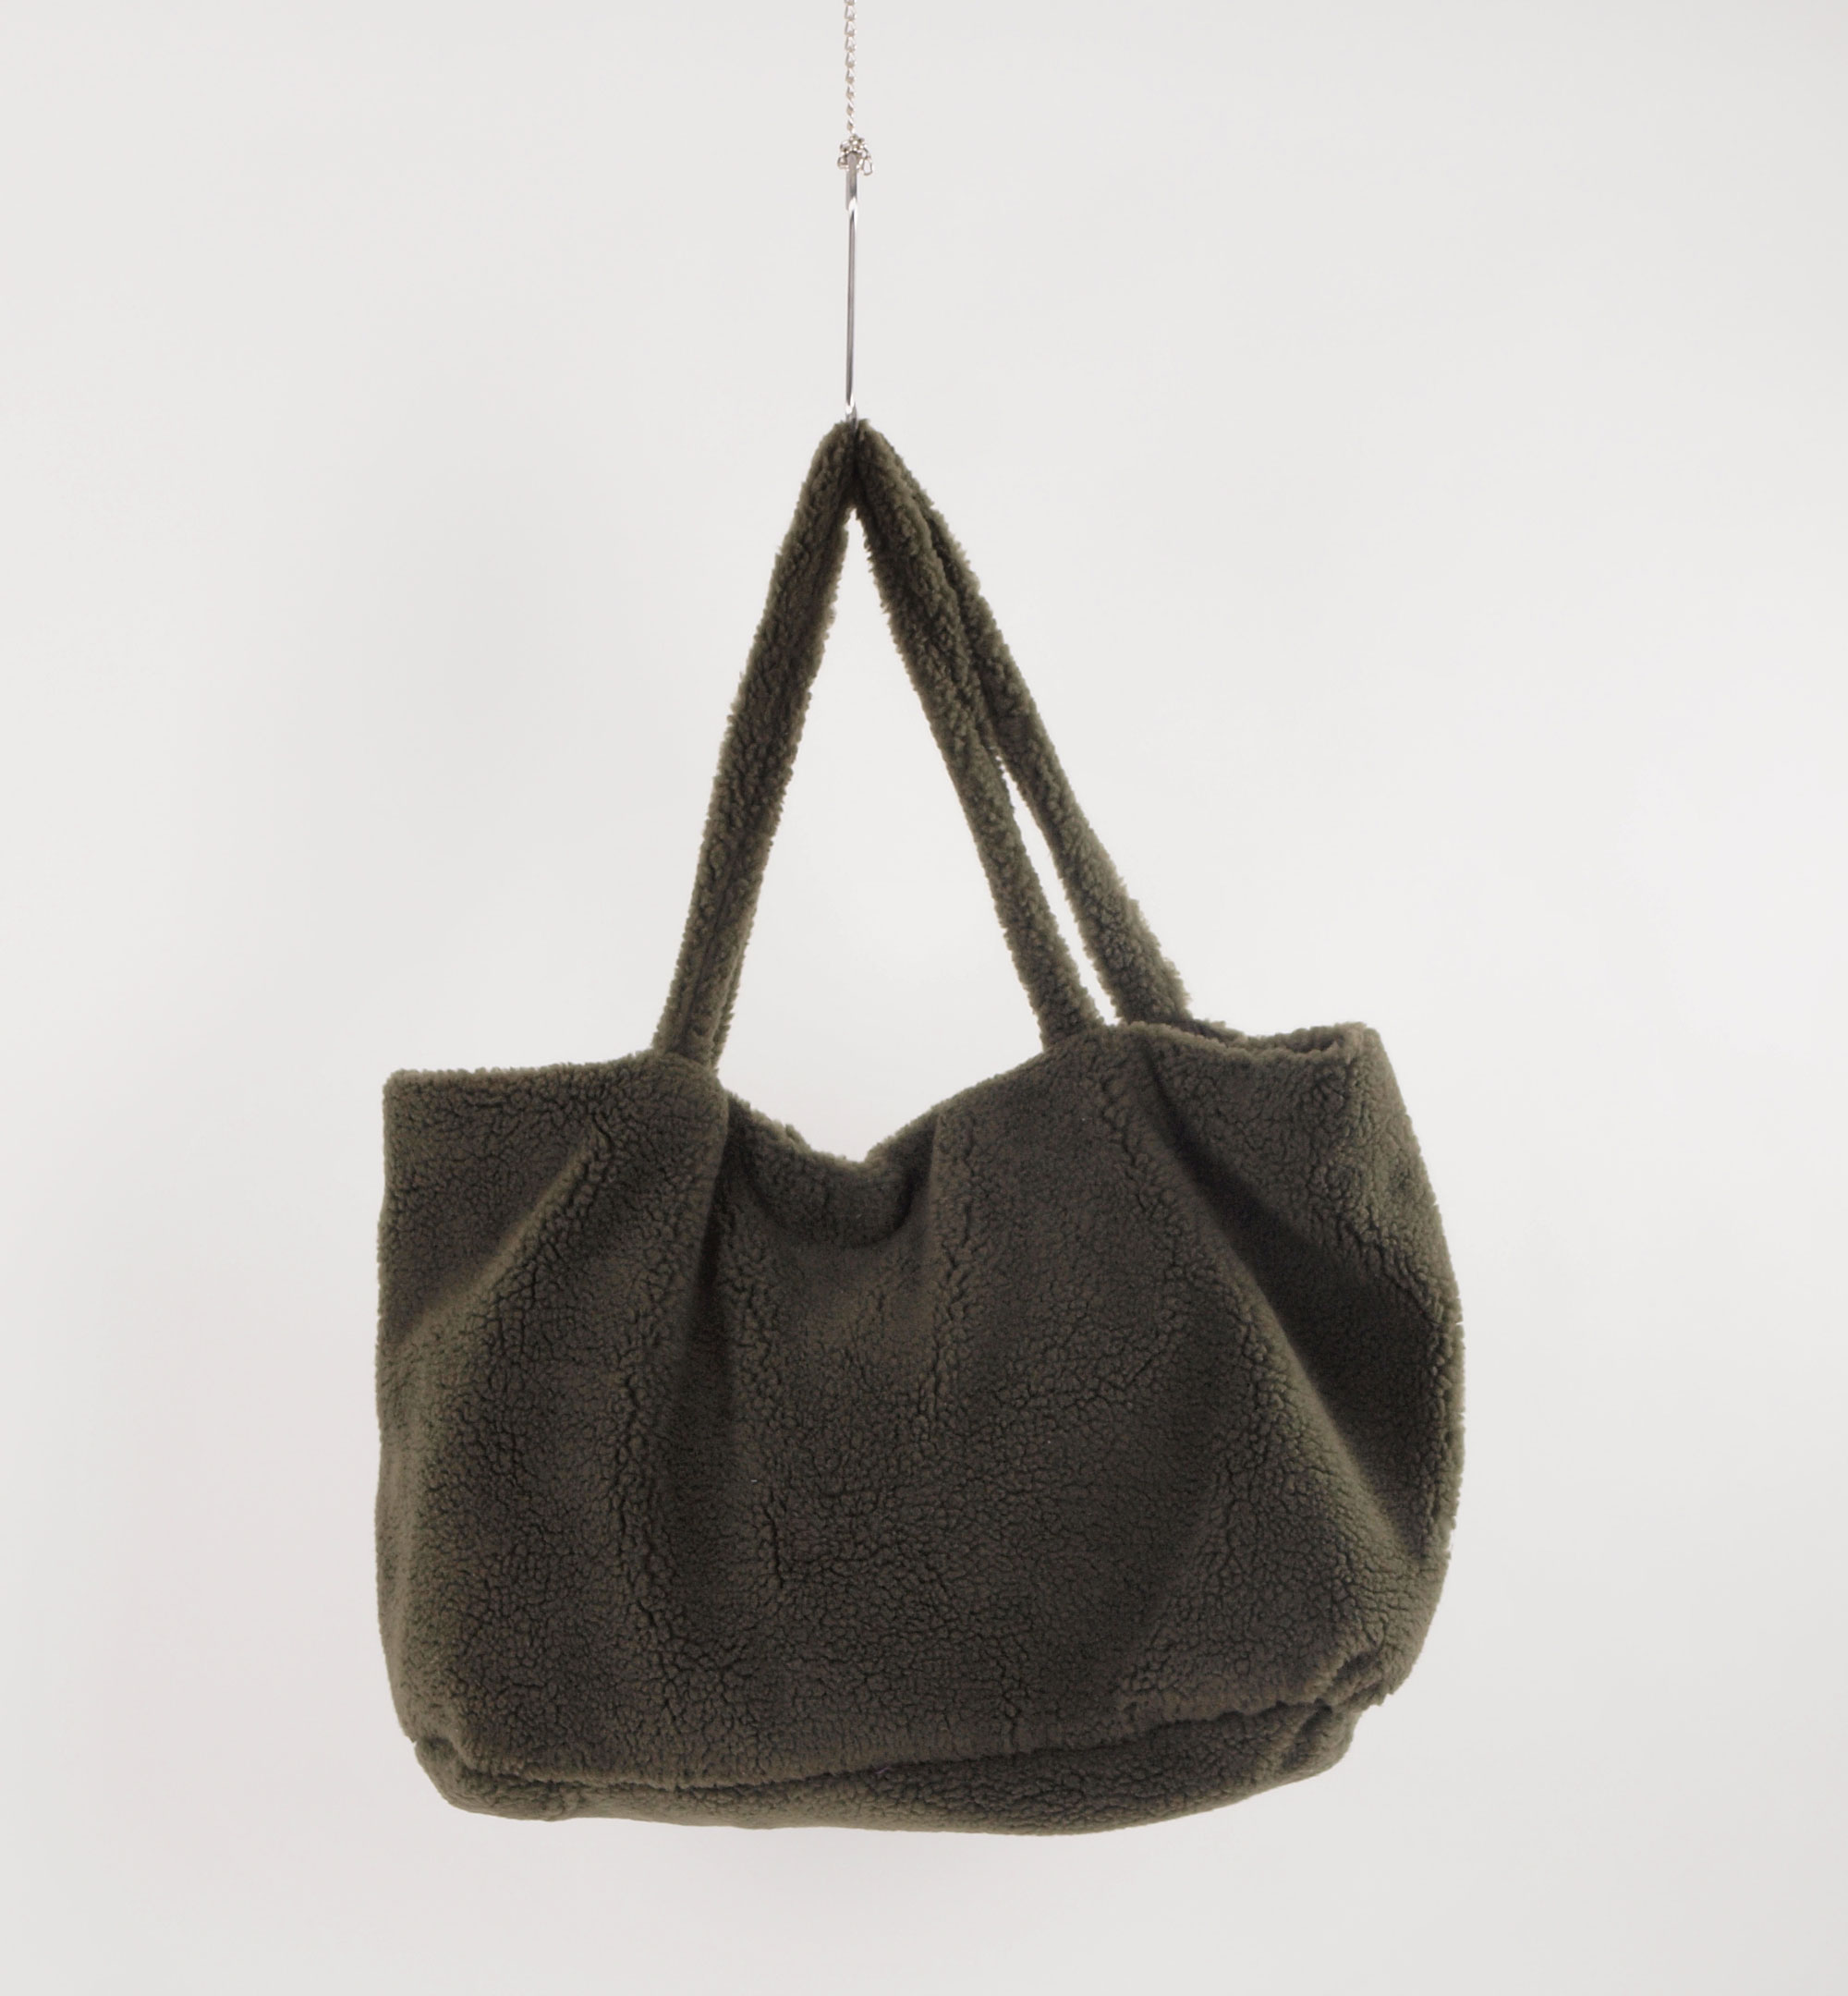 green-tote-bag.jpg